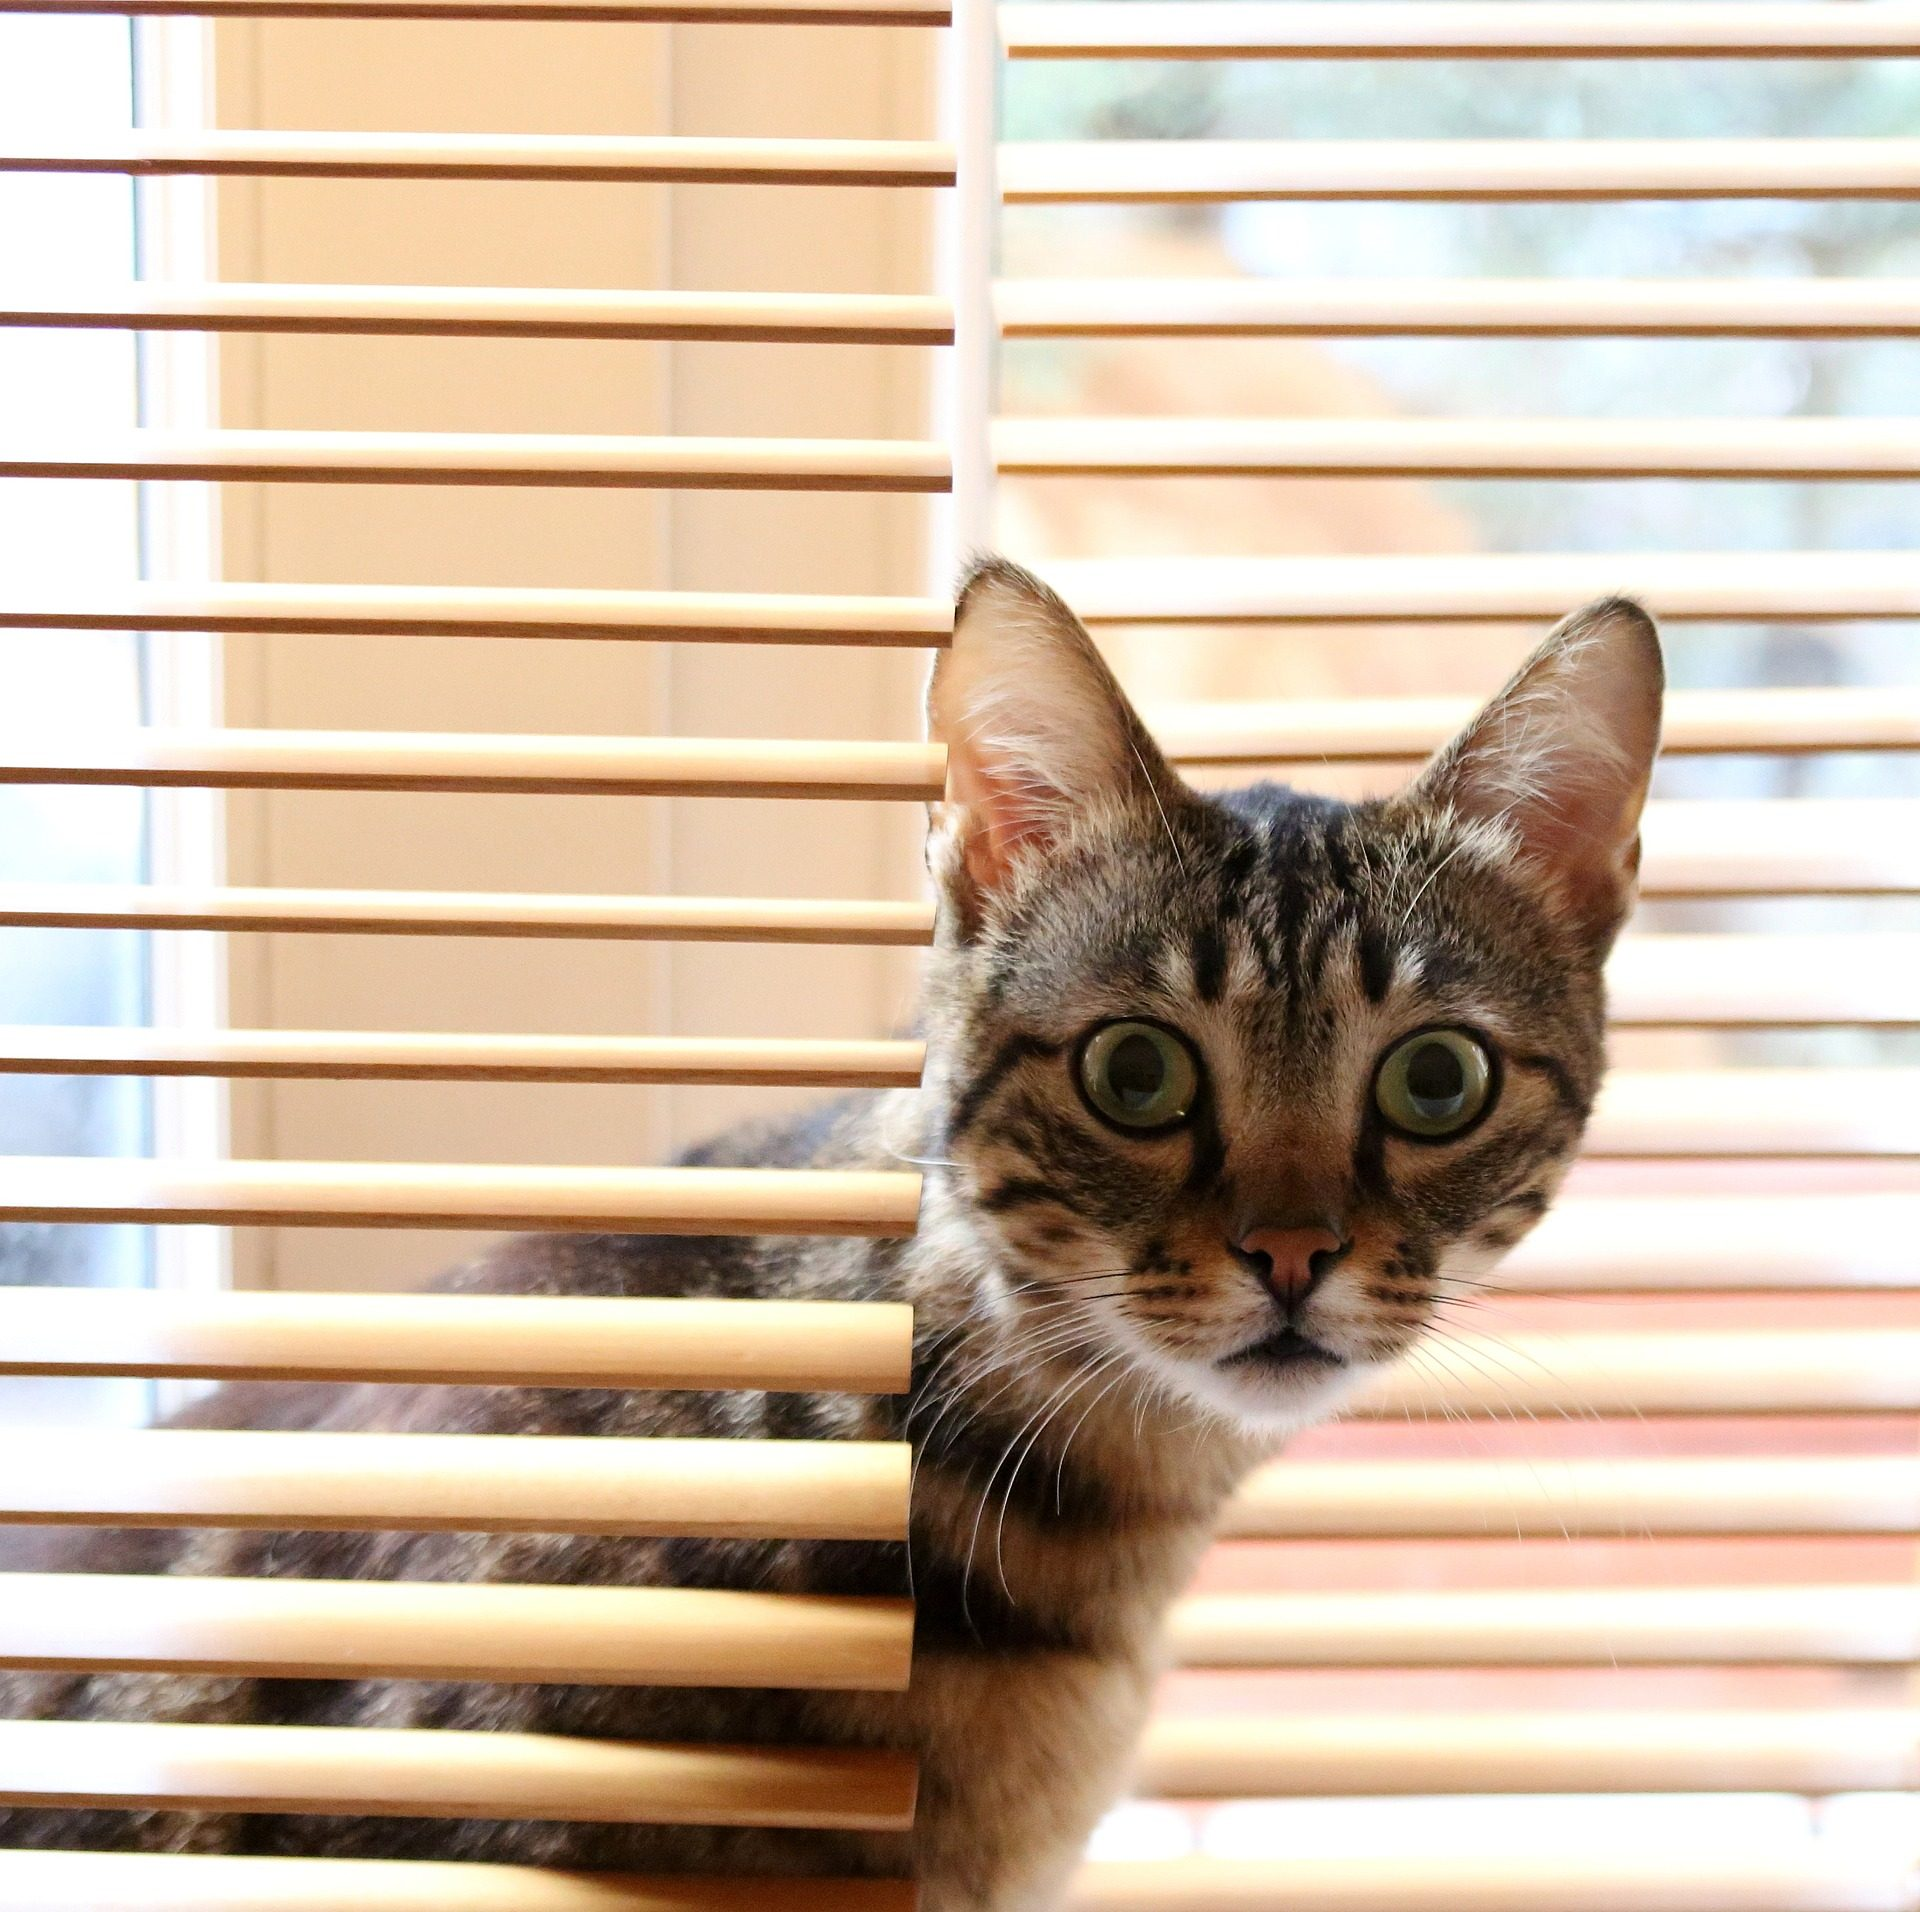 gato, felino, persiana, ventana, mirada, asombro - Fondos de Pantalla HD - professor-falken.com